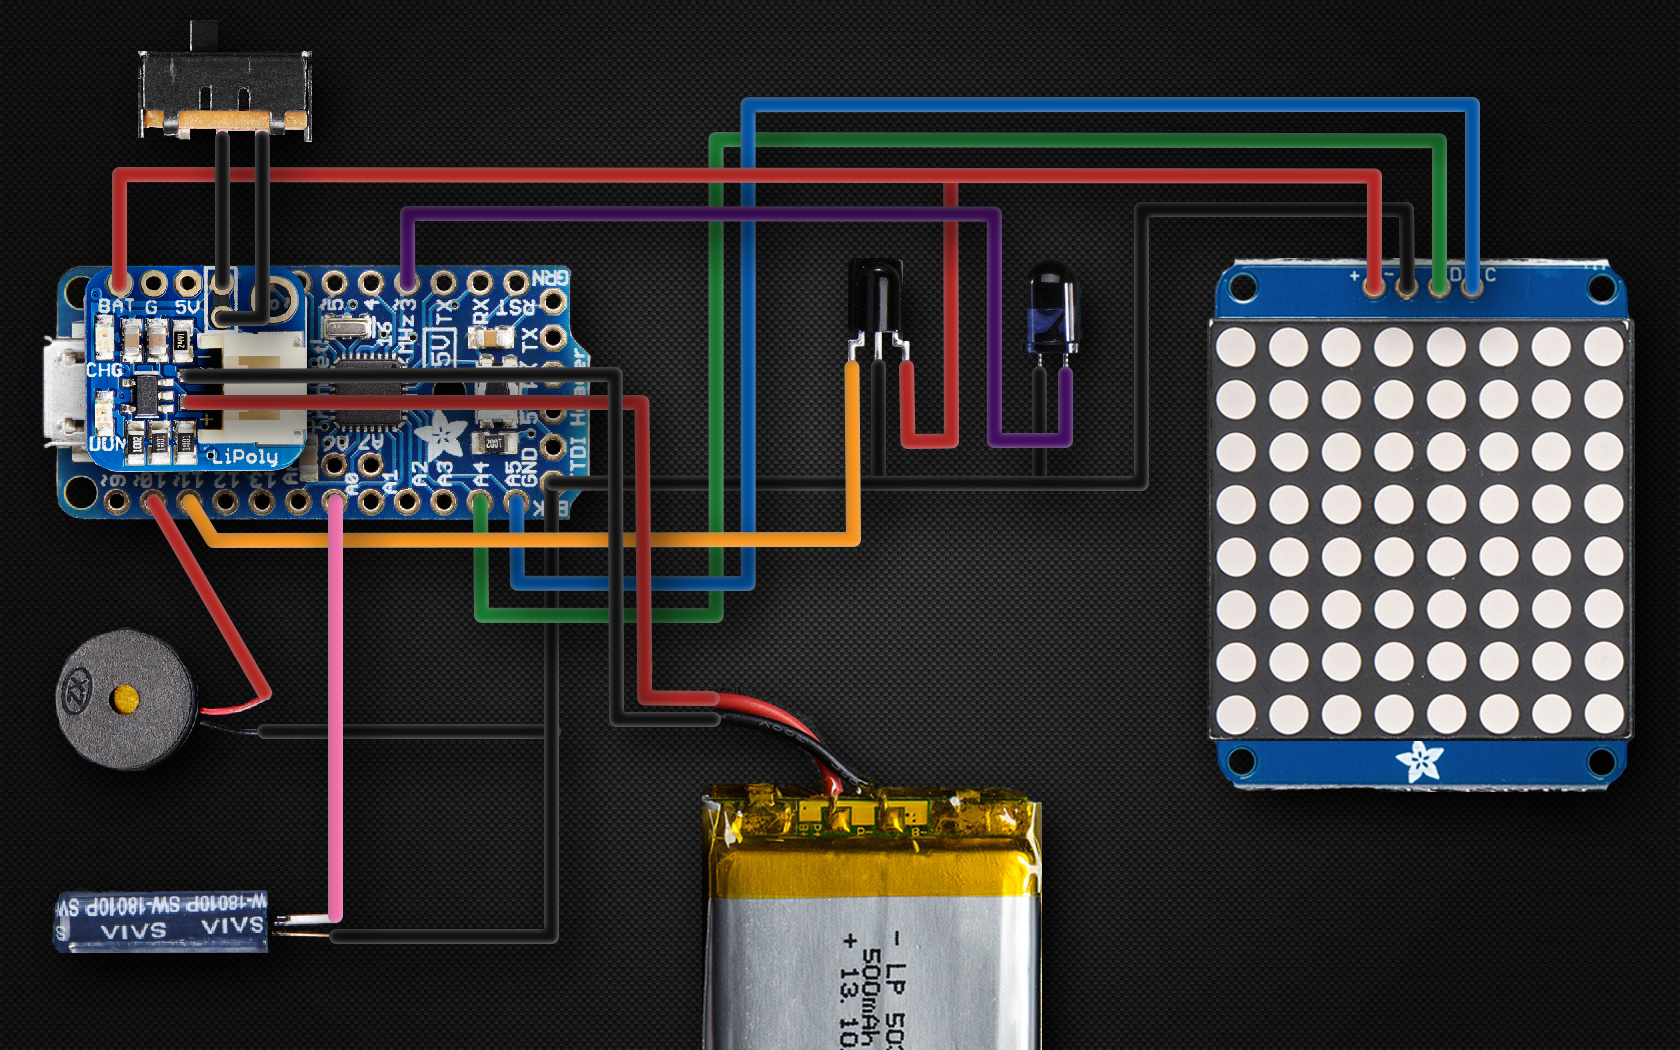 led_matrix_circuit_diagram.jpg